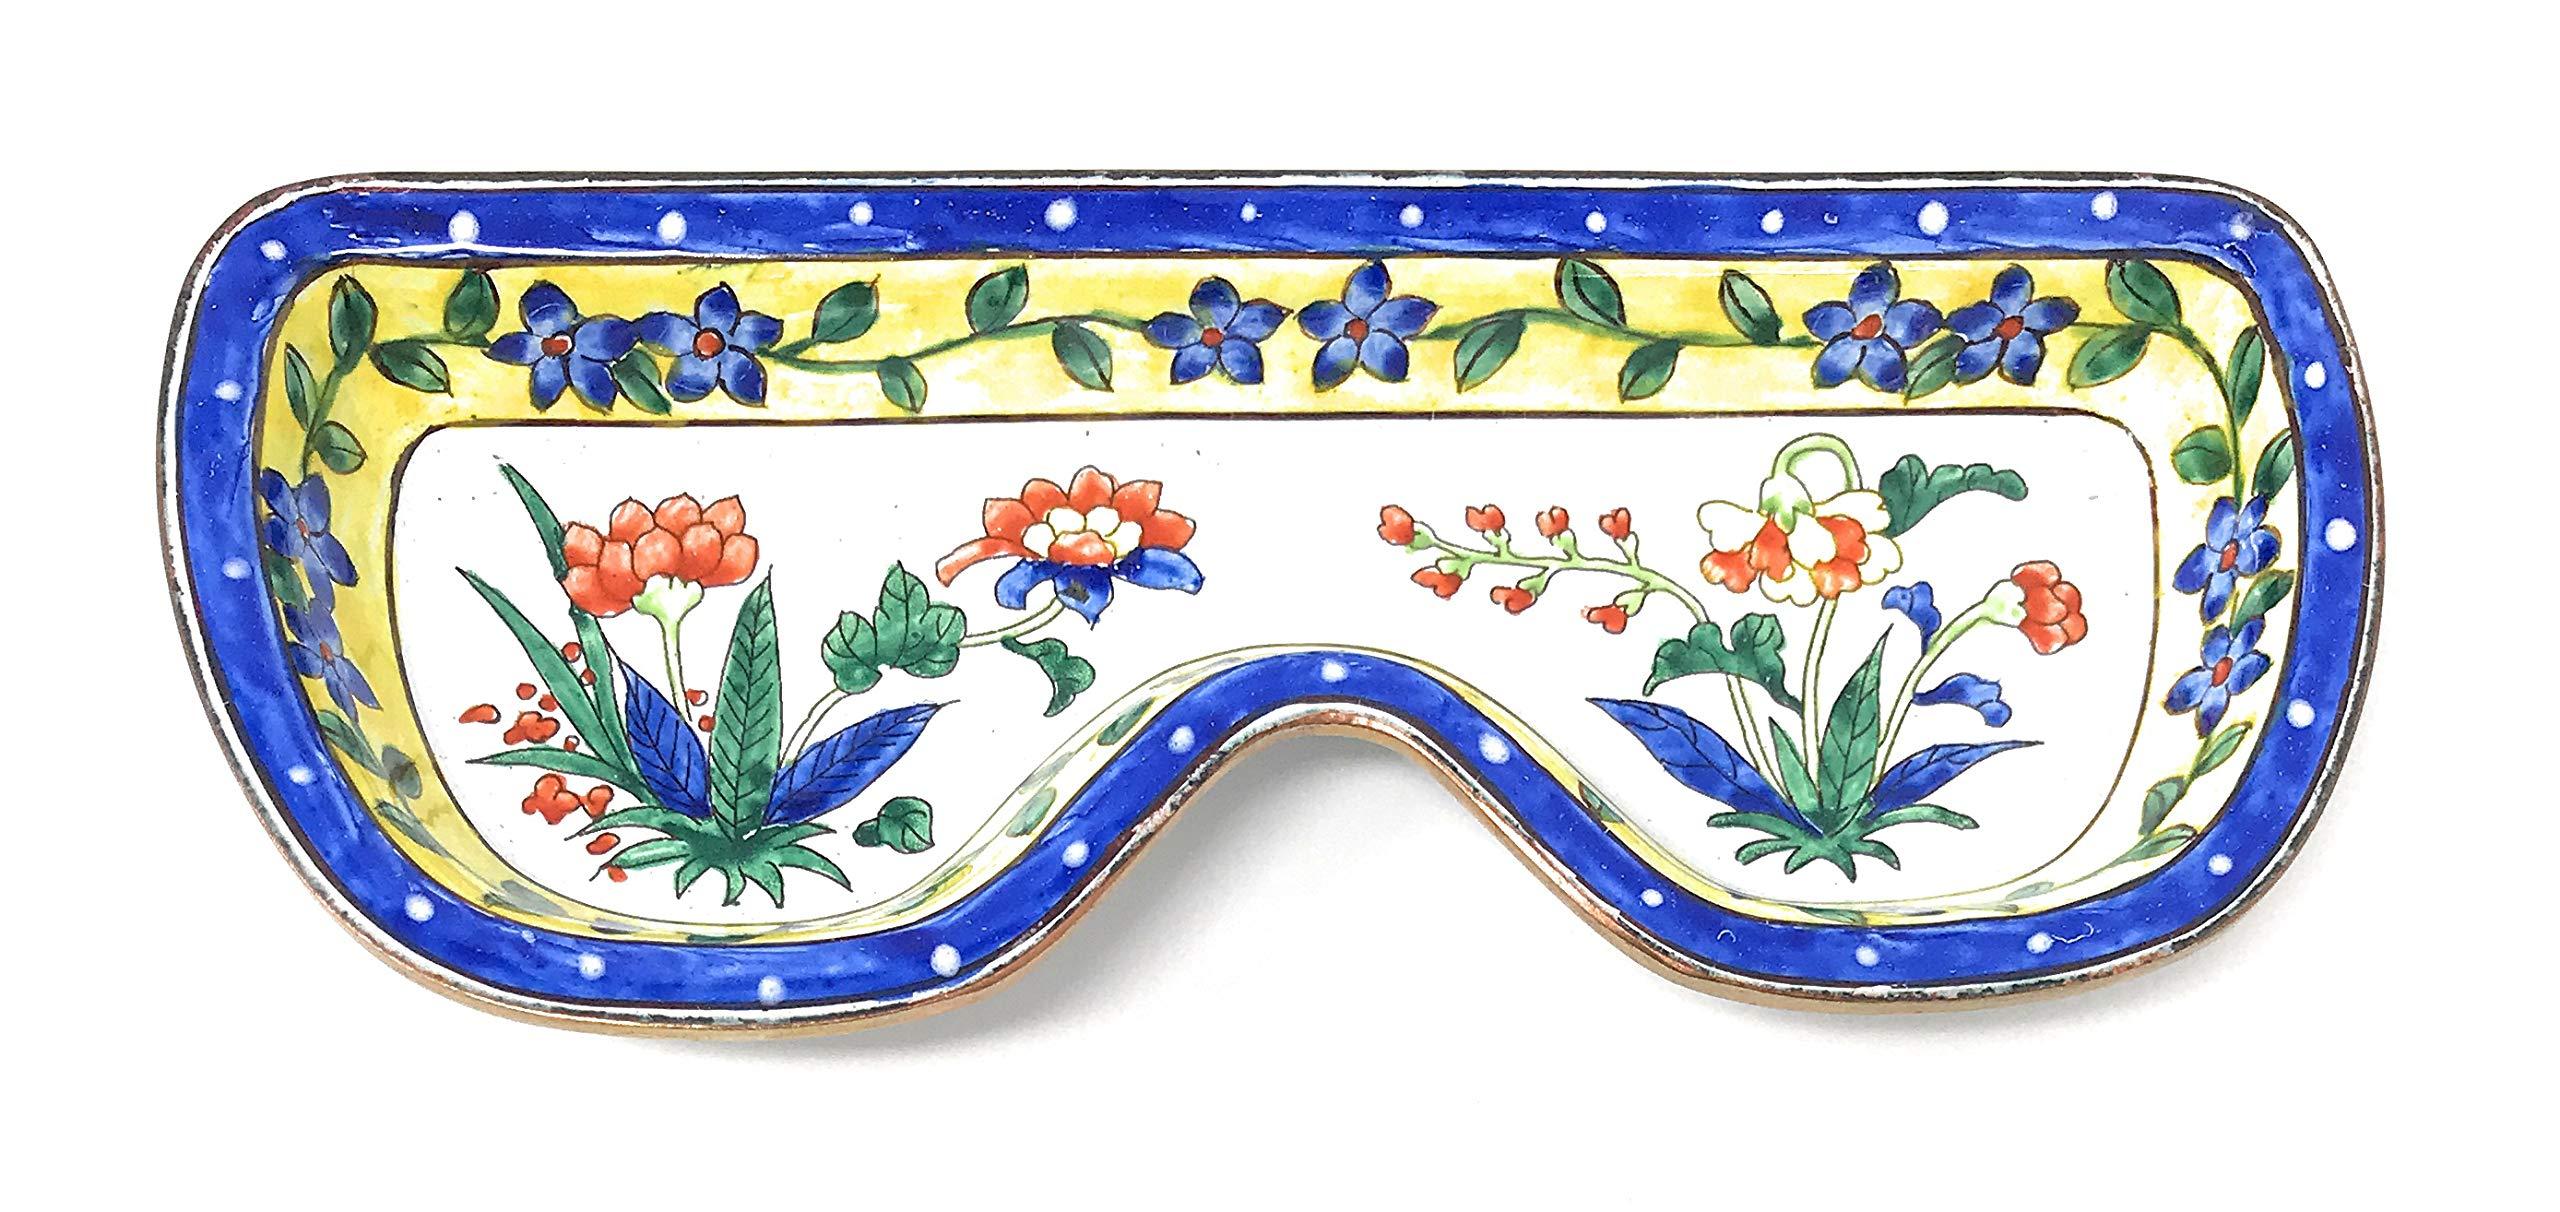 Kelvin Chen Floral Pattern, Eyeglass Tray, Enameled Holder, 6.5 Inches Long